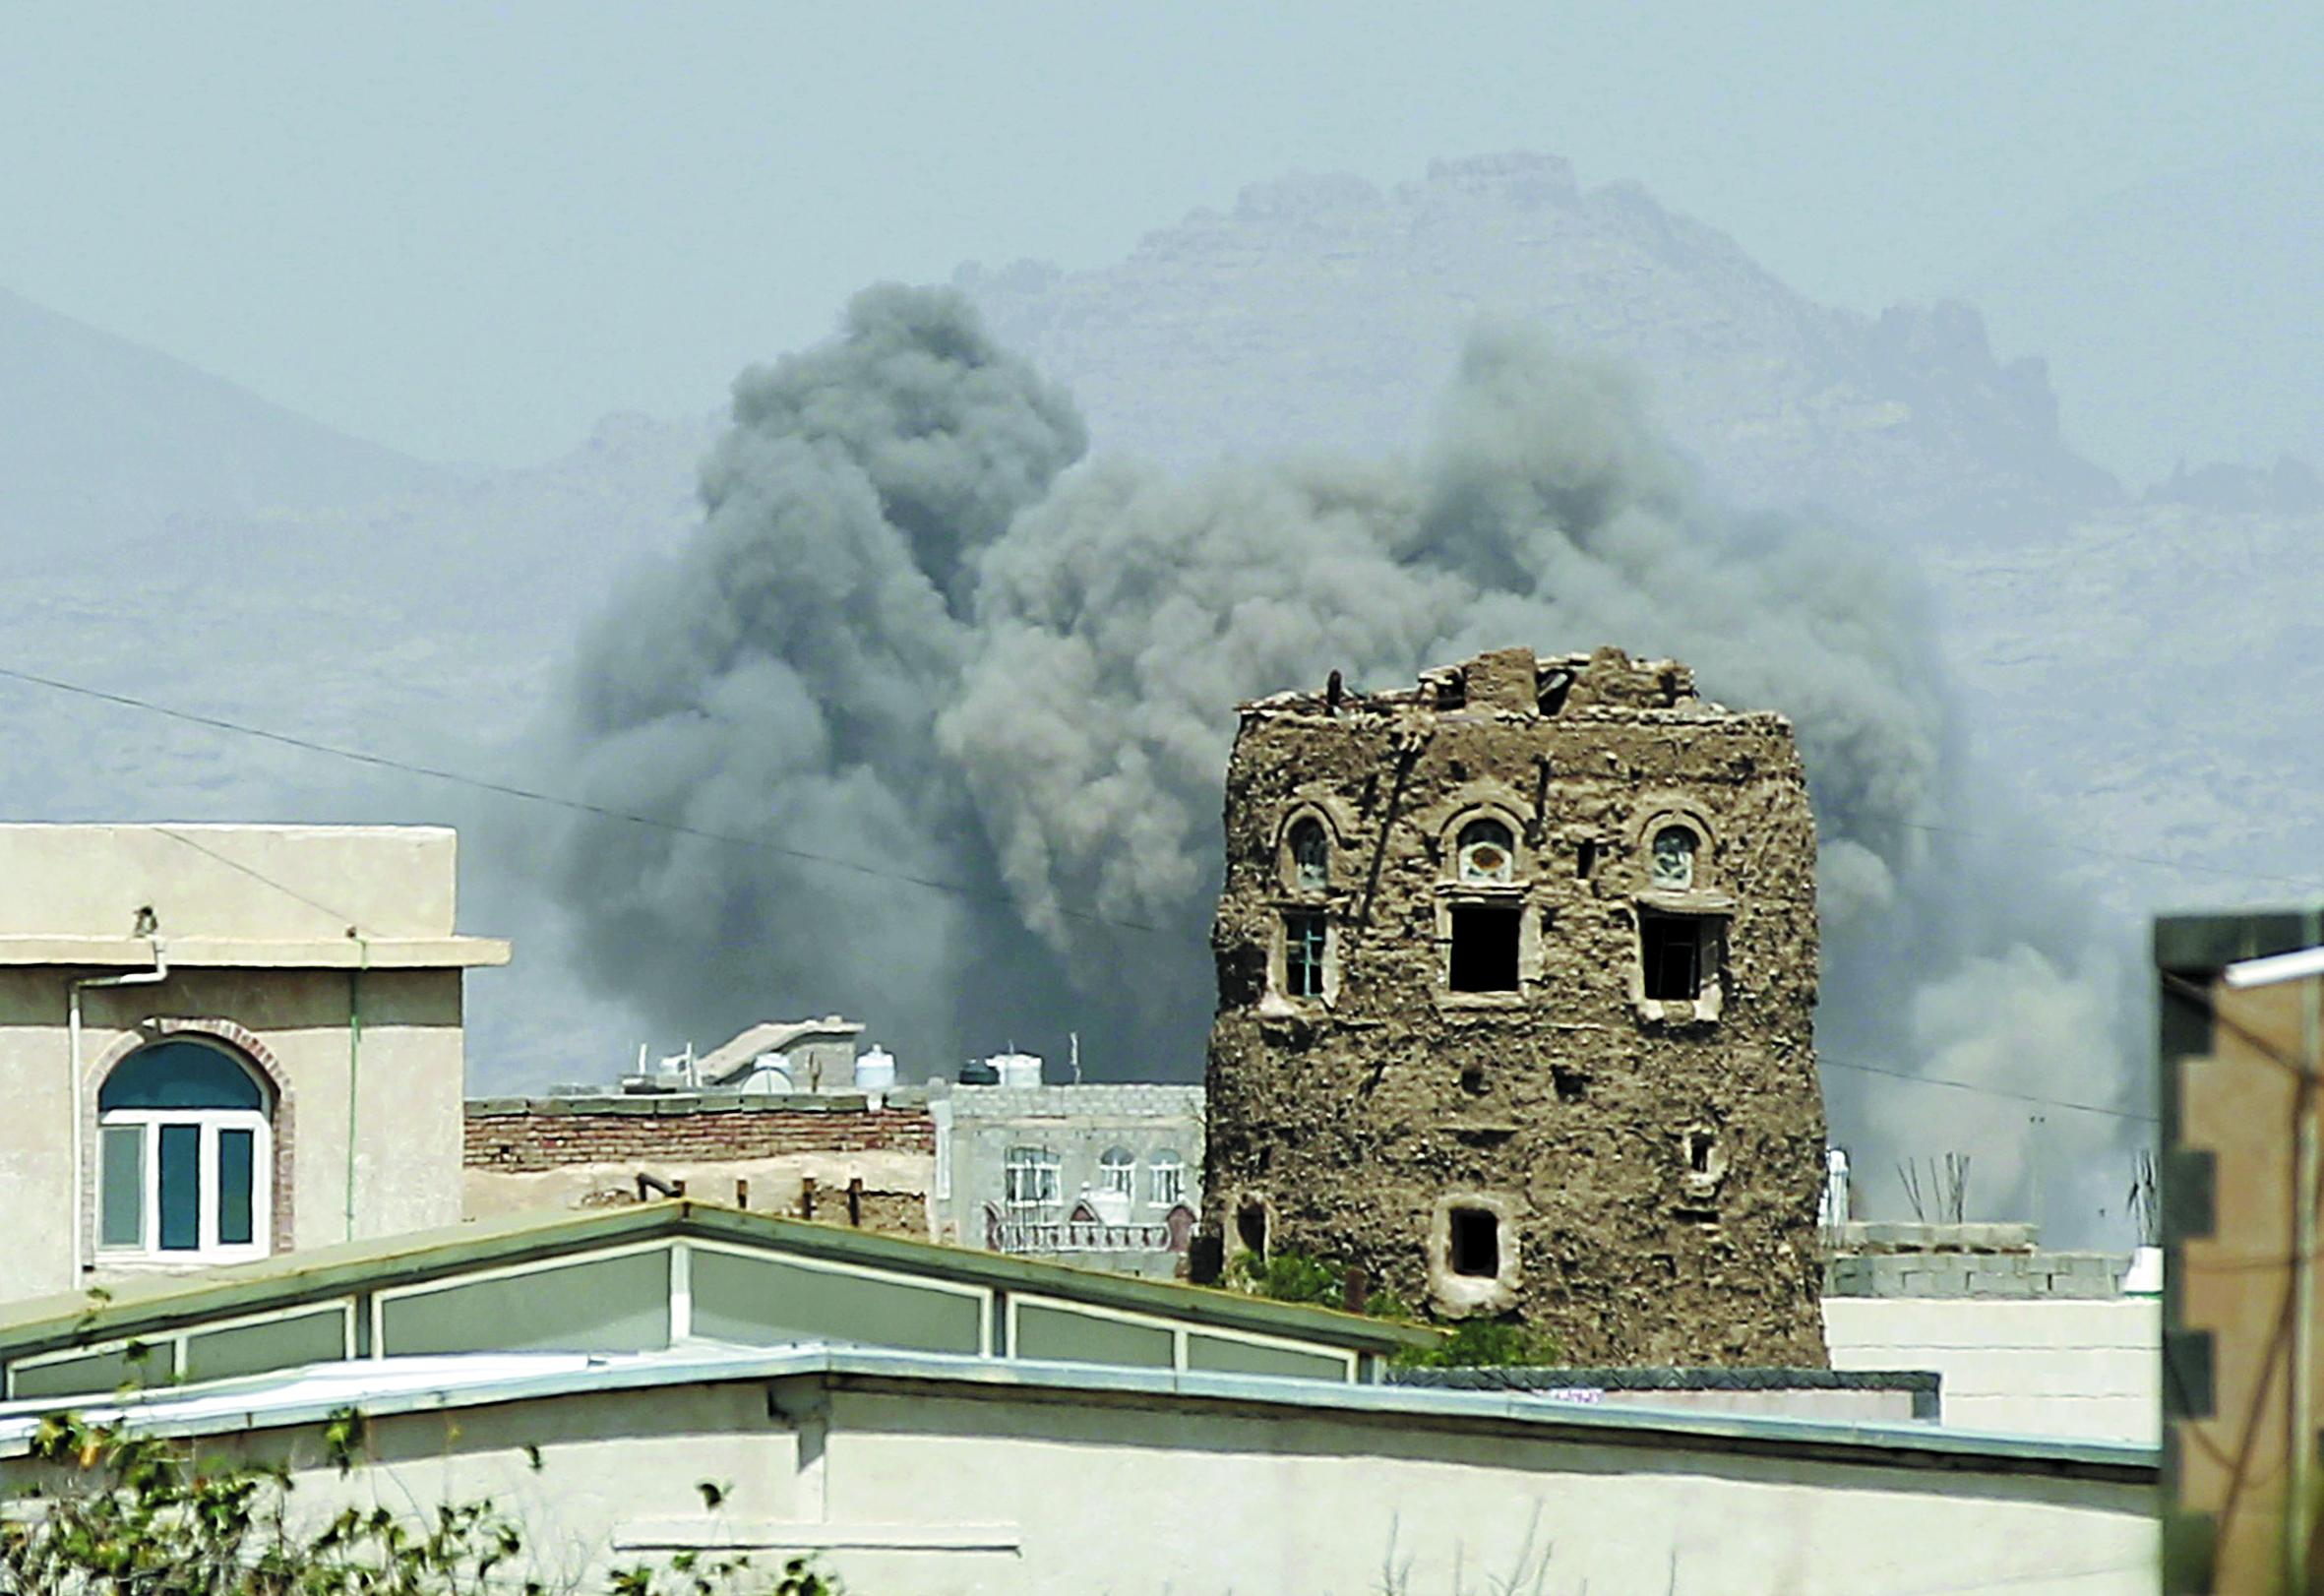 Violents raids de la coalition sur Sanaa